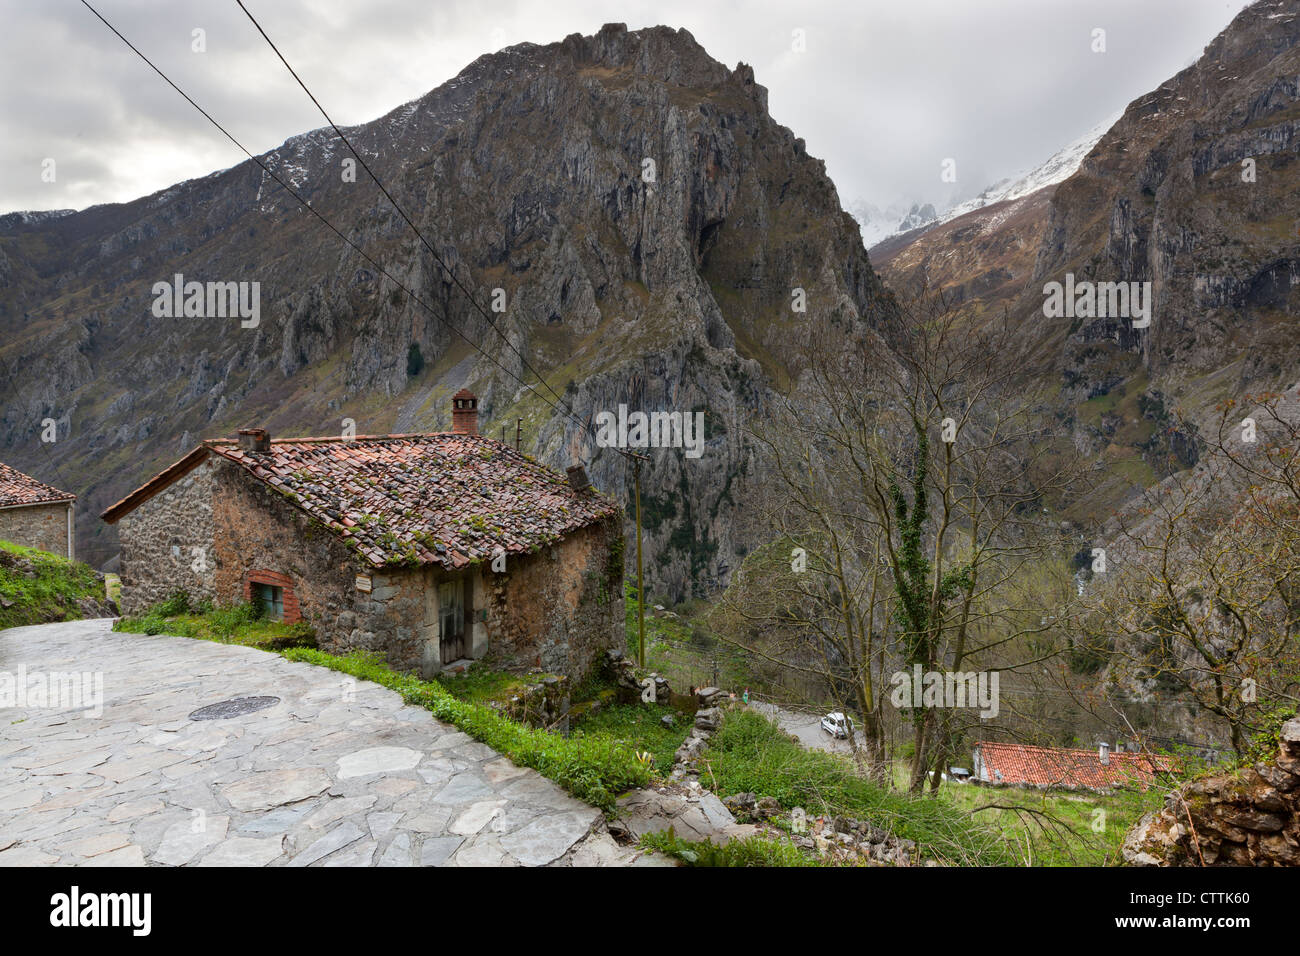 Camarmena Village on a shoulder of the Garganta del Cares gorge, Picos de Europa National Park, Asturias, Northern - Stock Image